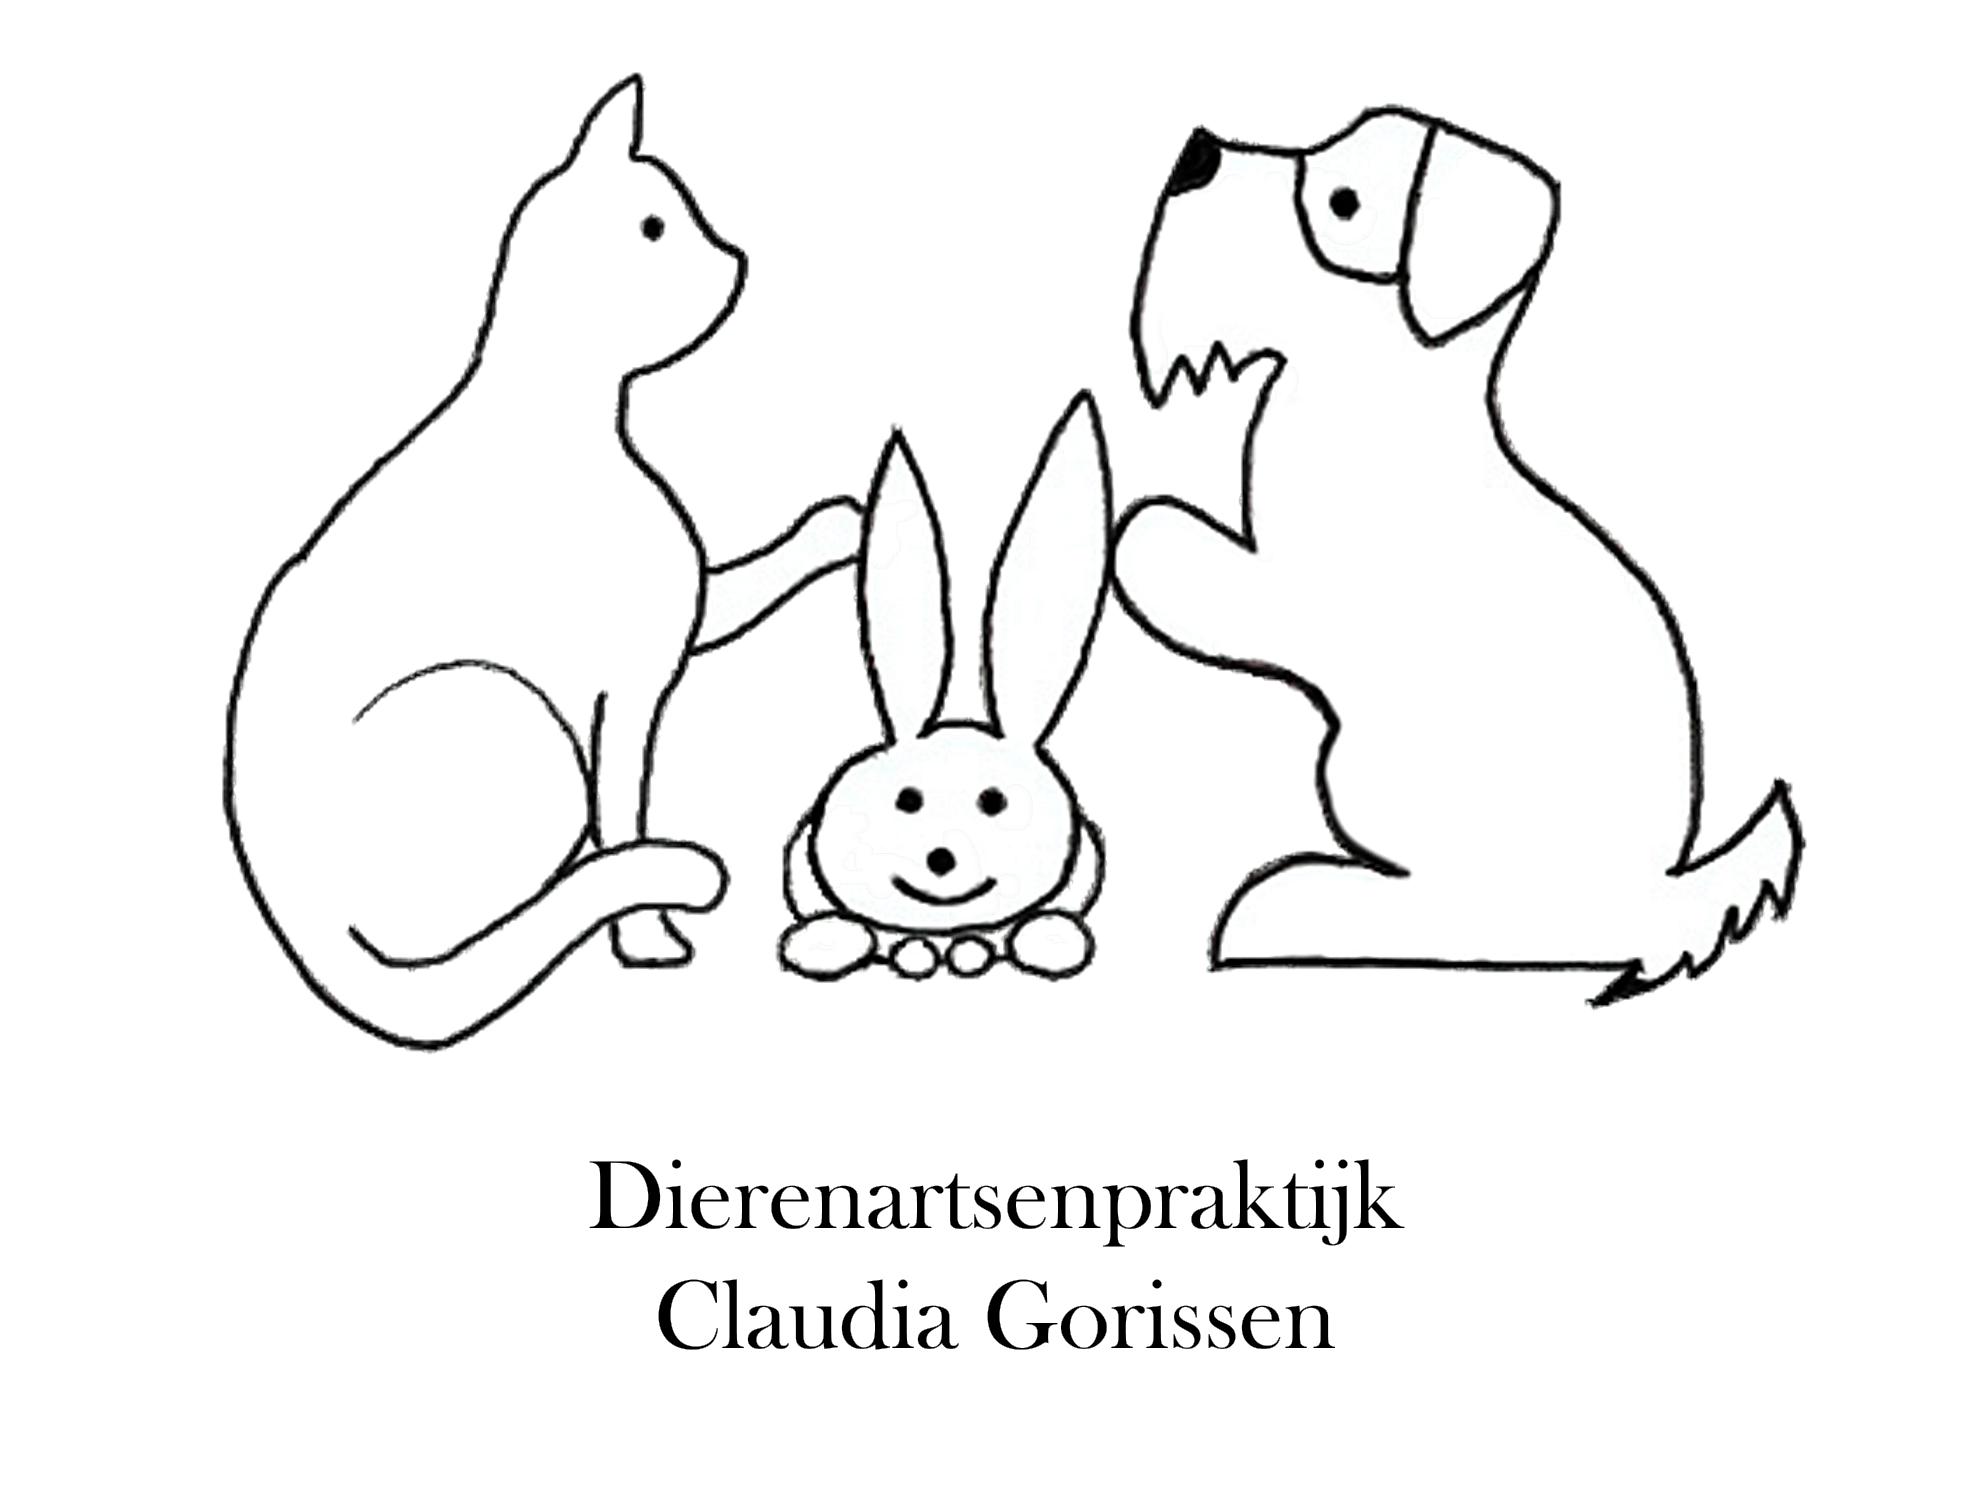 Dierenartsenpraktijk Claudia Gorissen